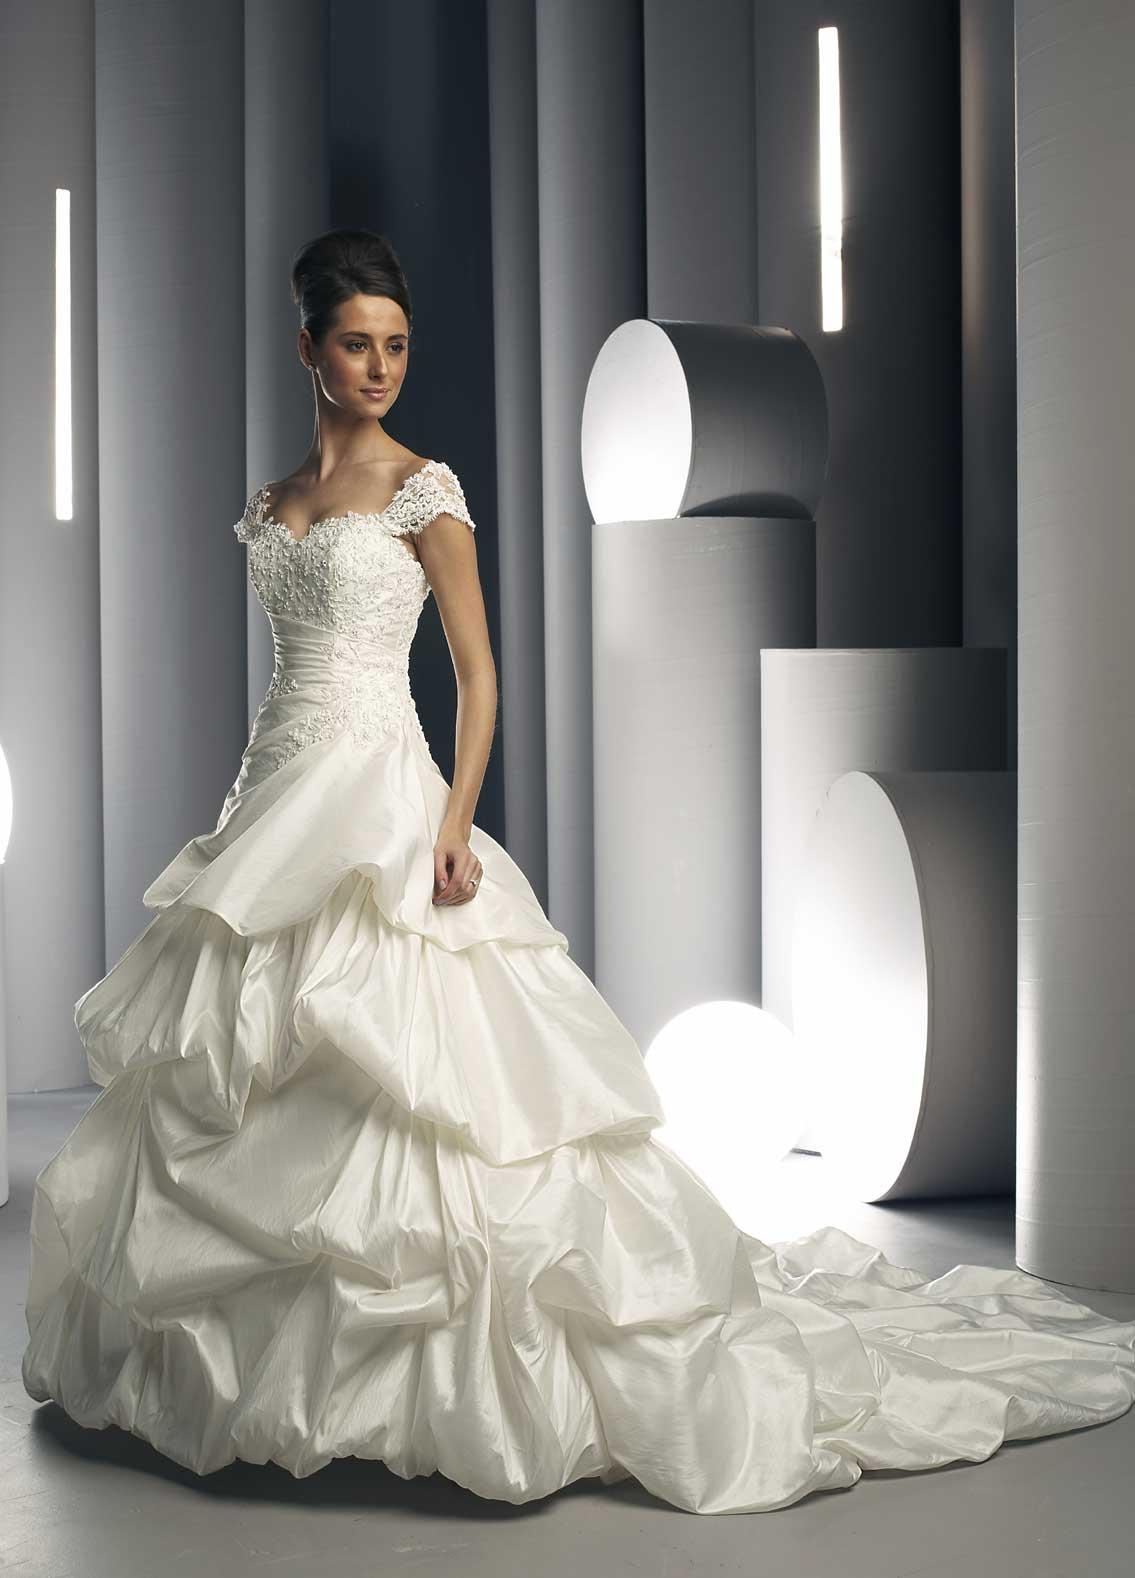 Faustine\'s blog: greek goddess wedding gown